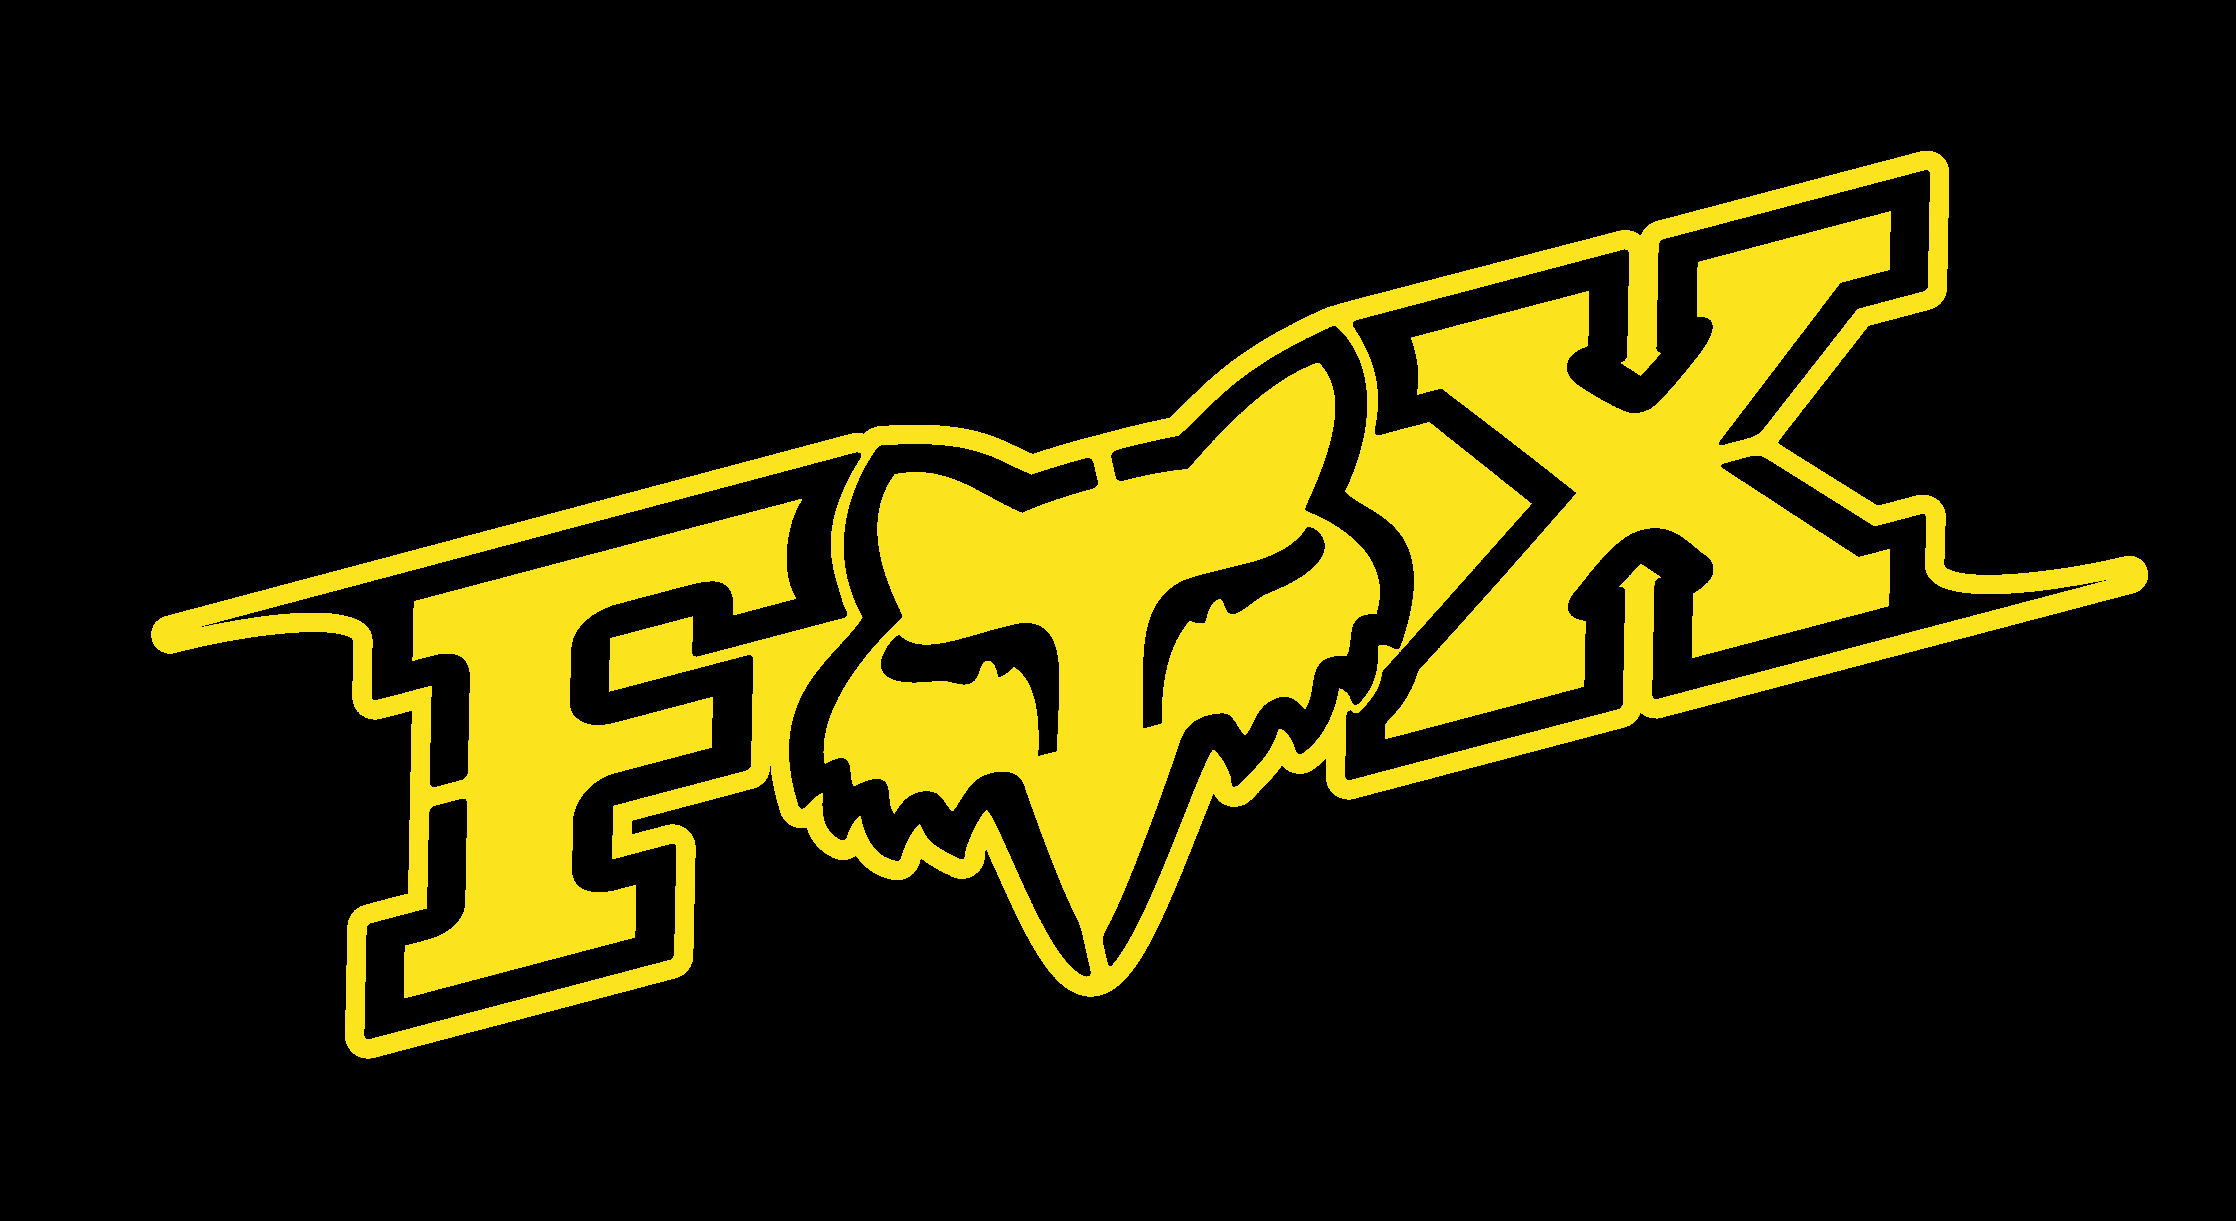 Wallpaper 796653 Fox Racing Wallpaper 806858 Fox Racing Wallpaper 2236x1221